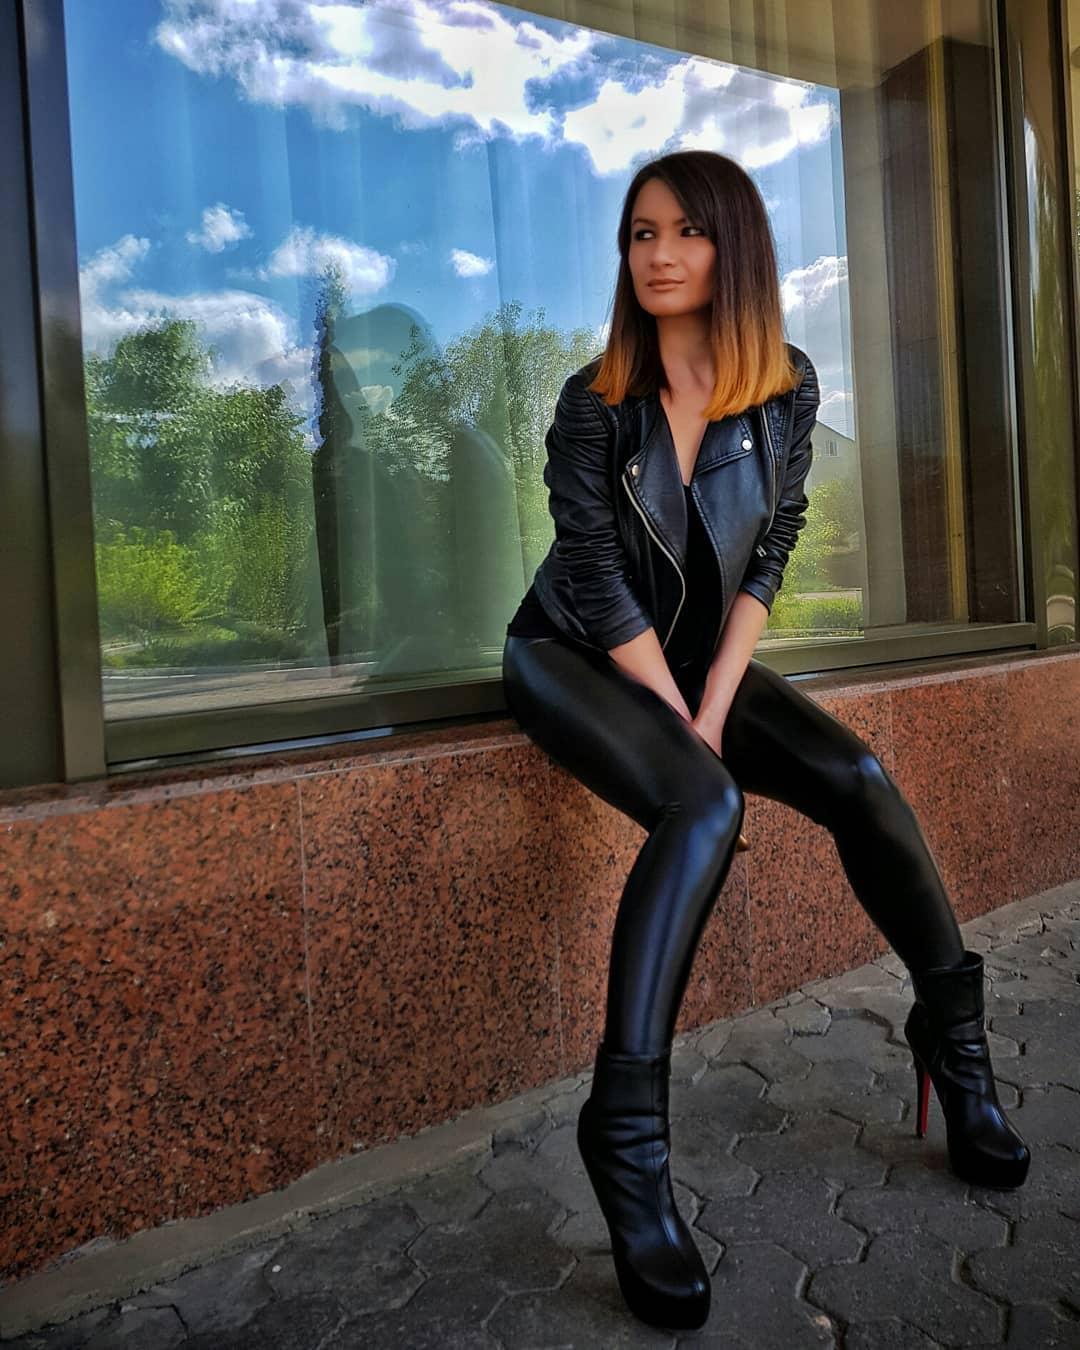 Olga-Madych-Wallpapers-Insta-Fit-Bio-14